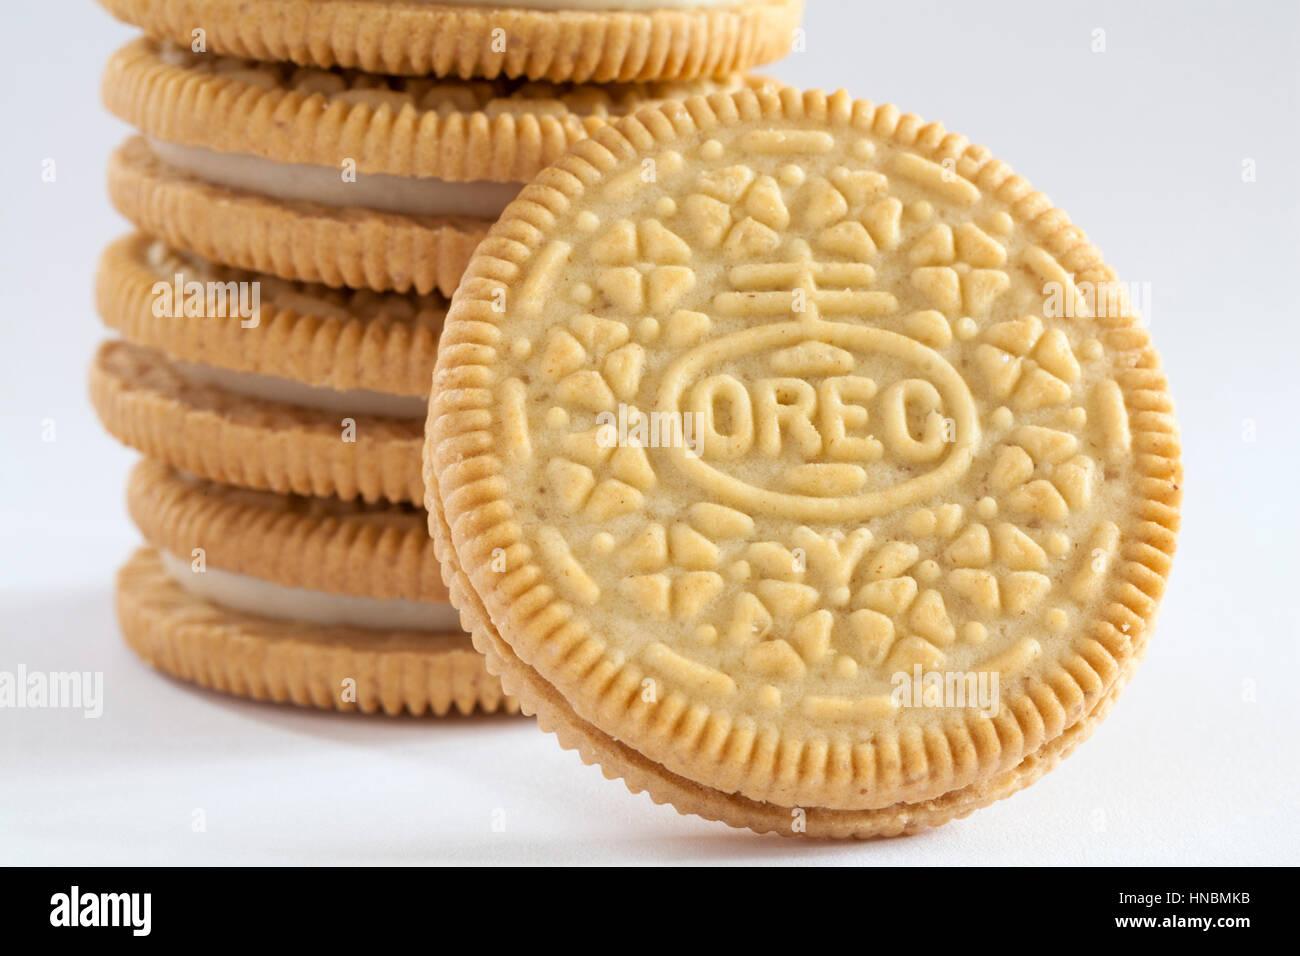 White Chocolate Golden Oreo Pie